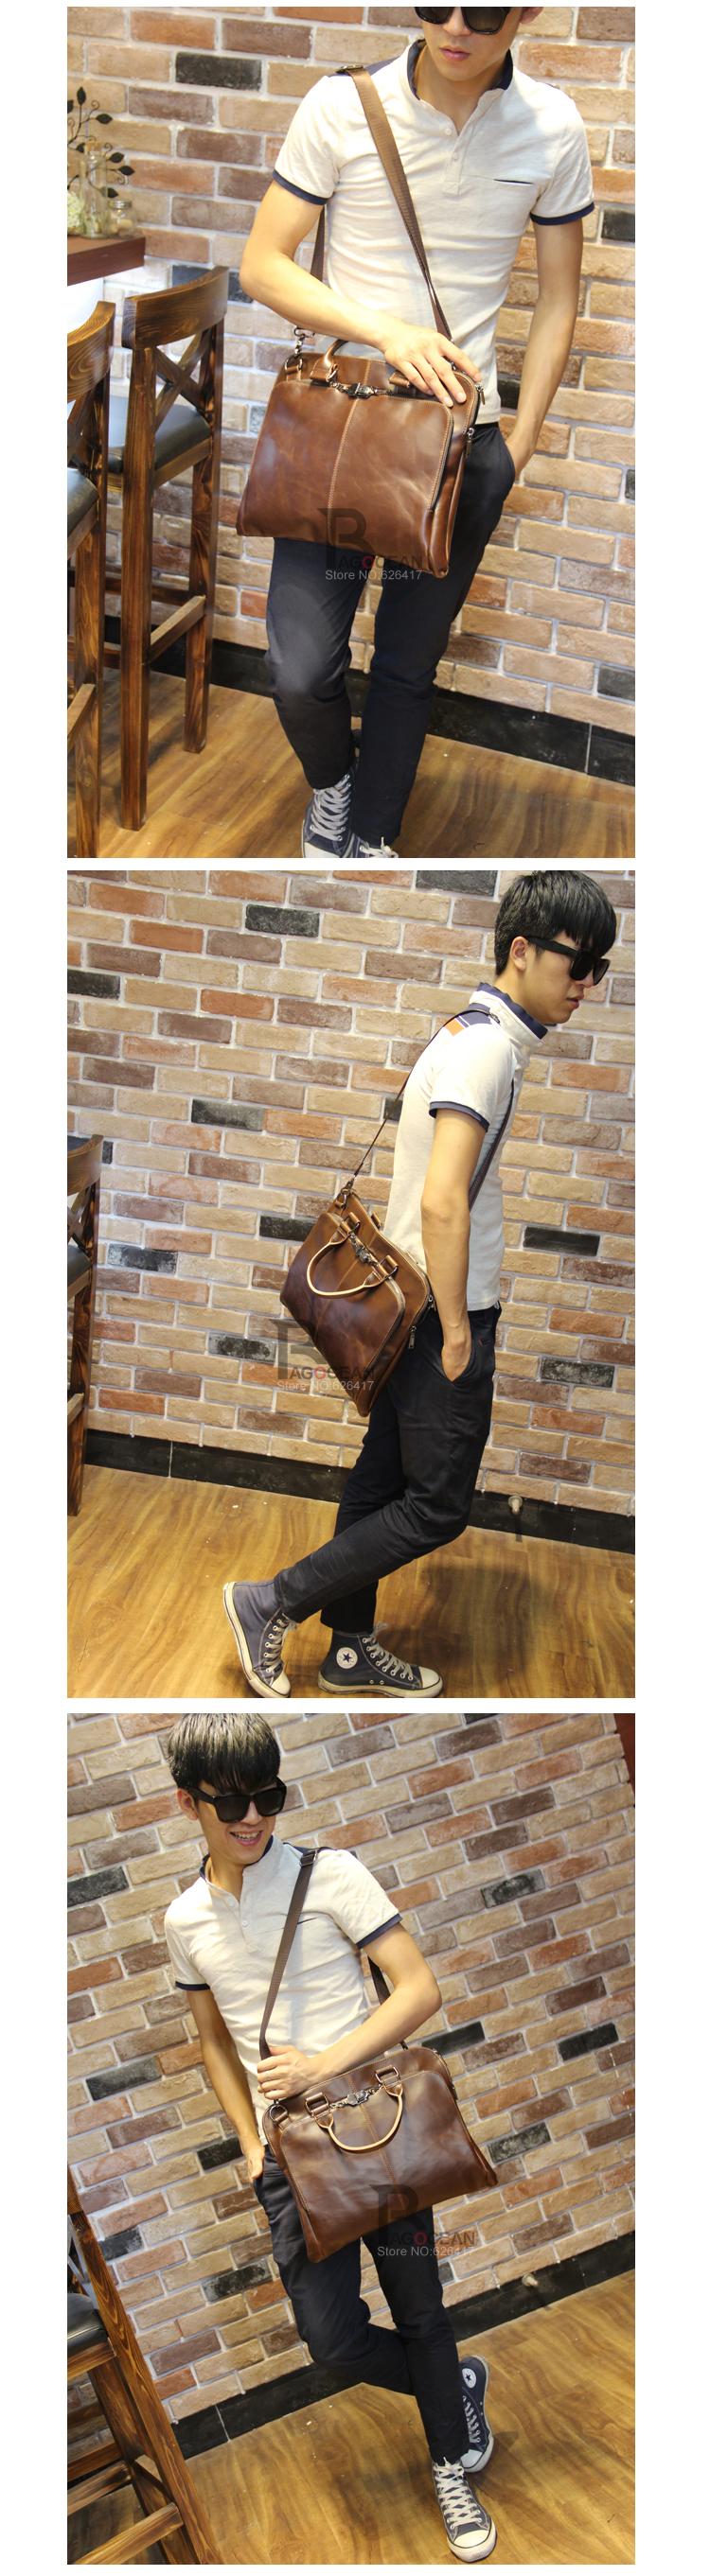 "New high quality pu leather Shoulder leisure men's bag business messenger portable briefcase Laptop large Purse 14"" Handbag 9"